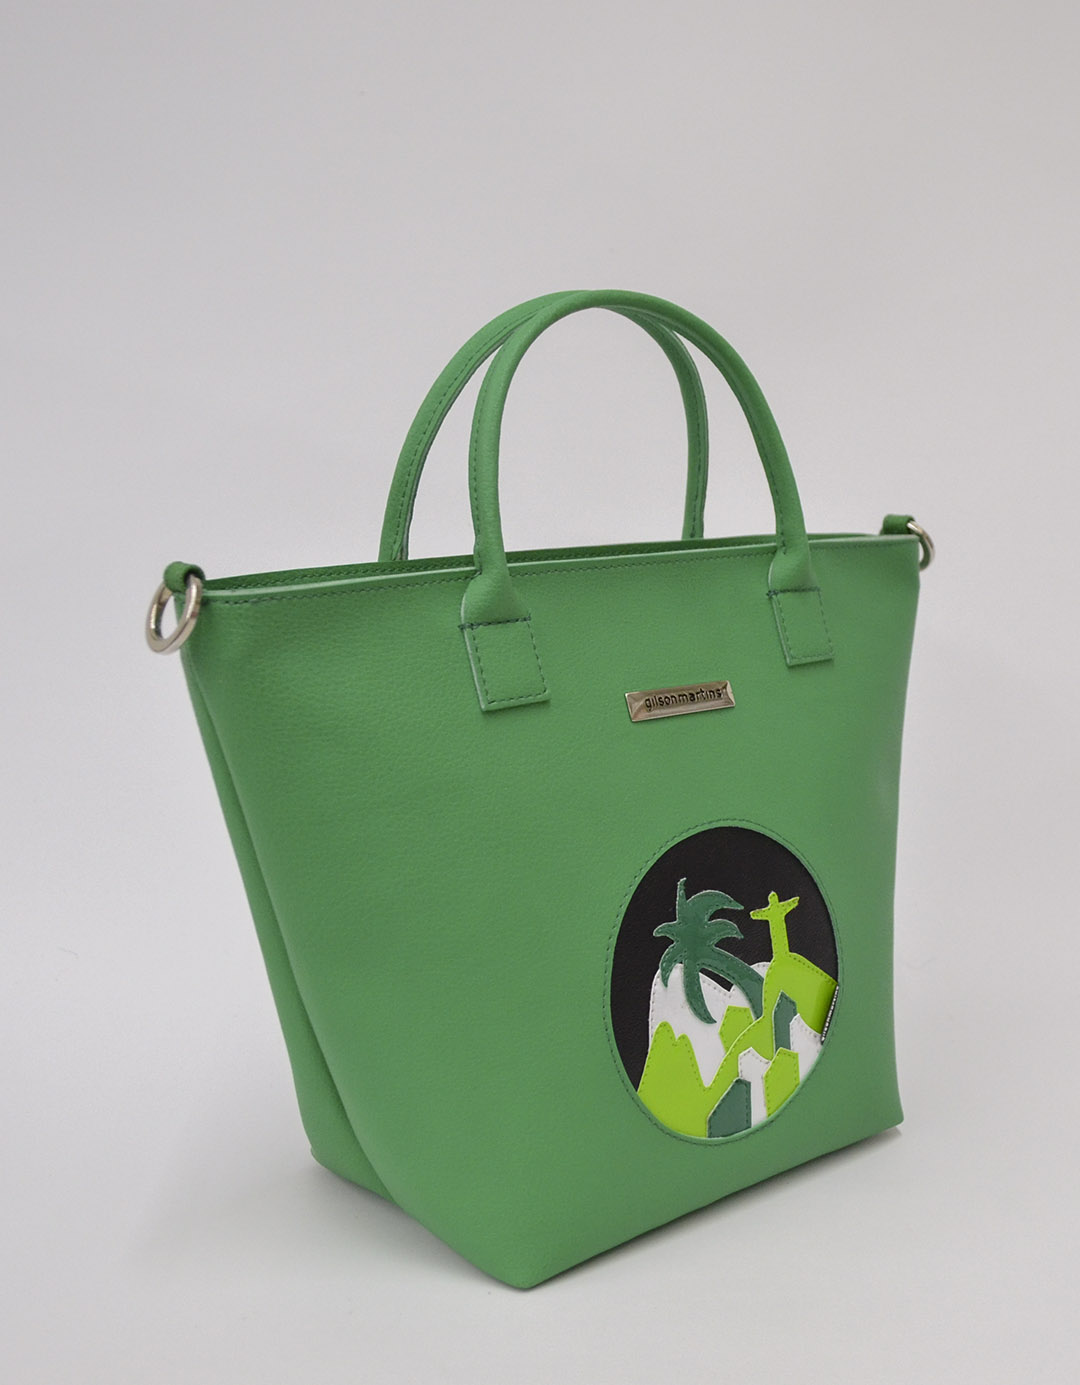 Bolsa Customizada Verde Exclusiva Bela Lixo Nobre